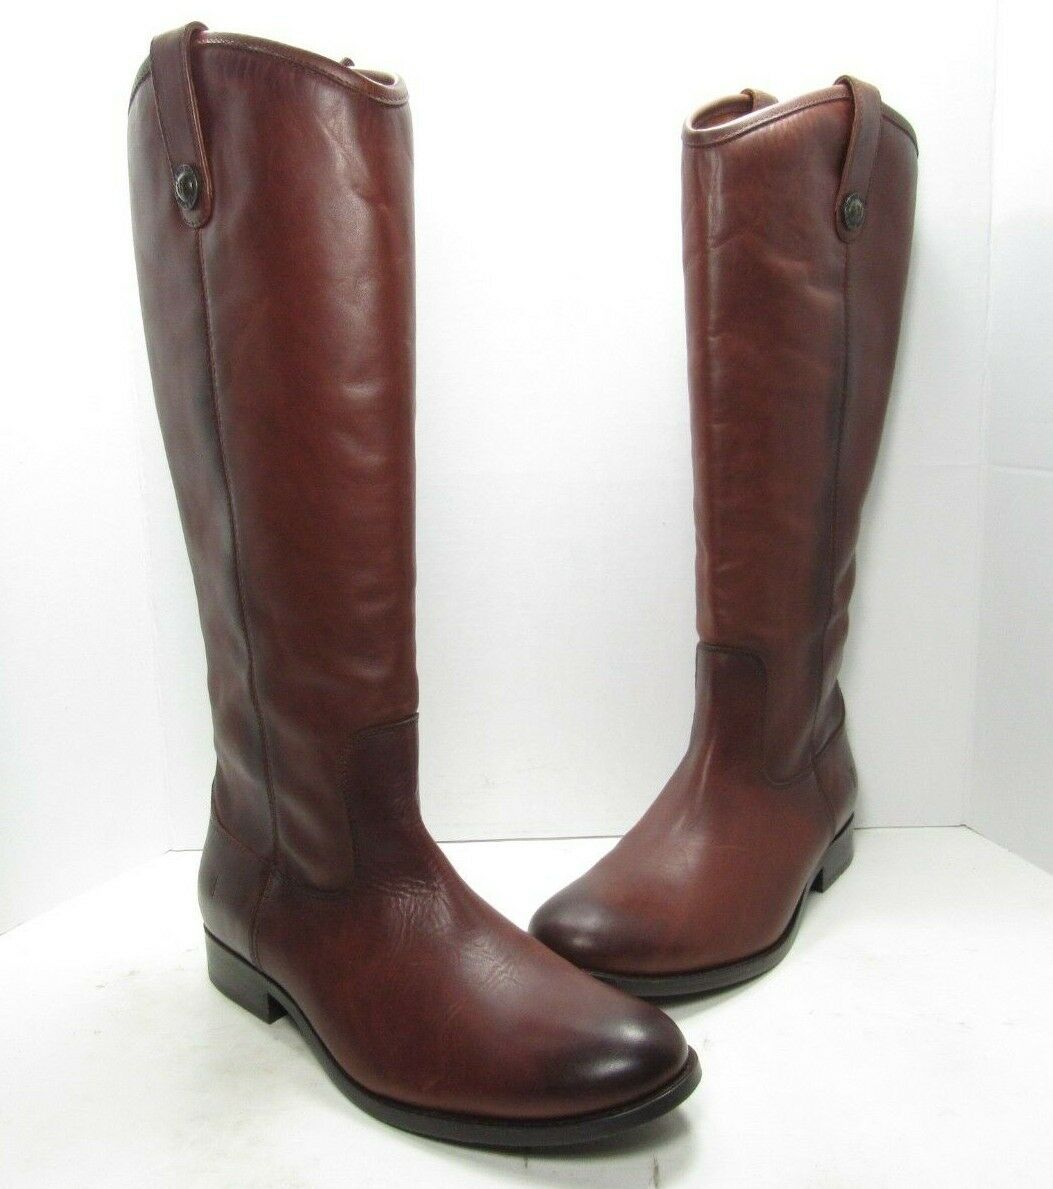 Frye Melissa Button 2 Fashion Boots, Women's Size 8.5 Medium (B628)